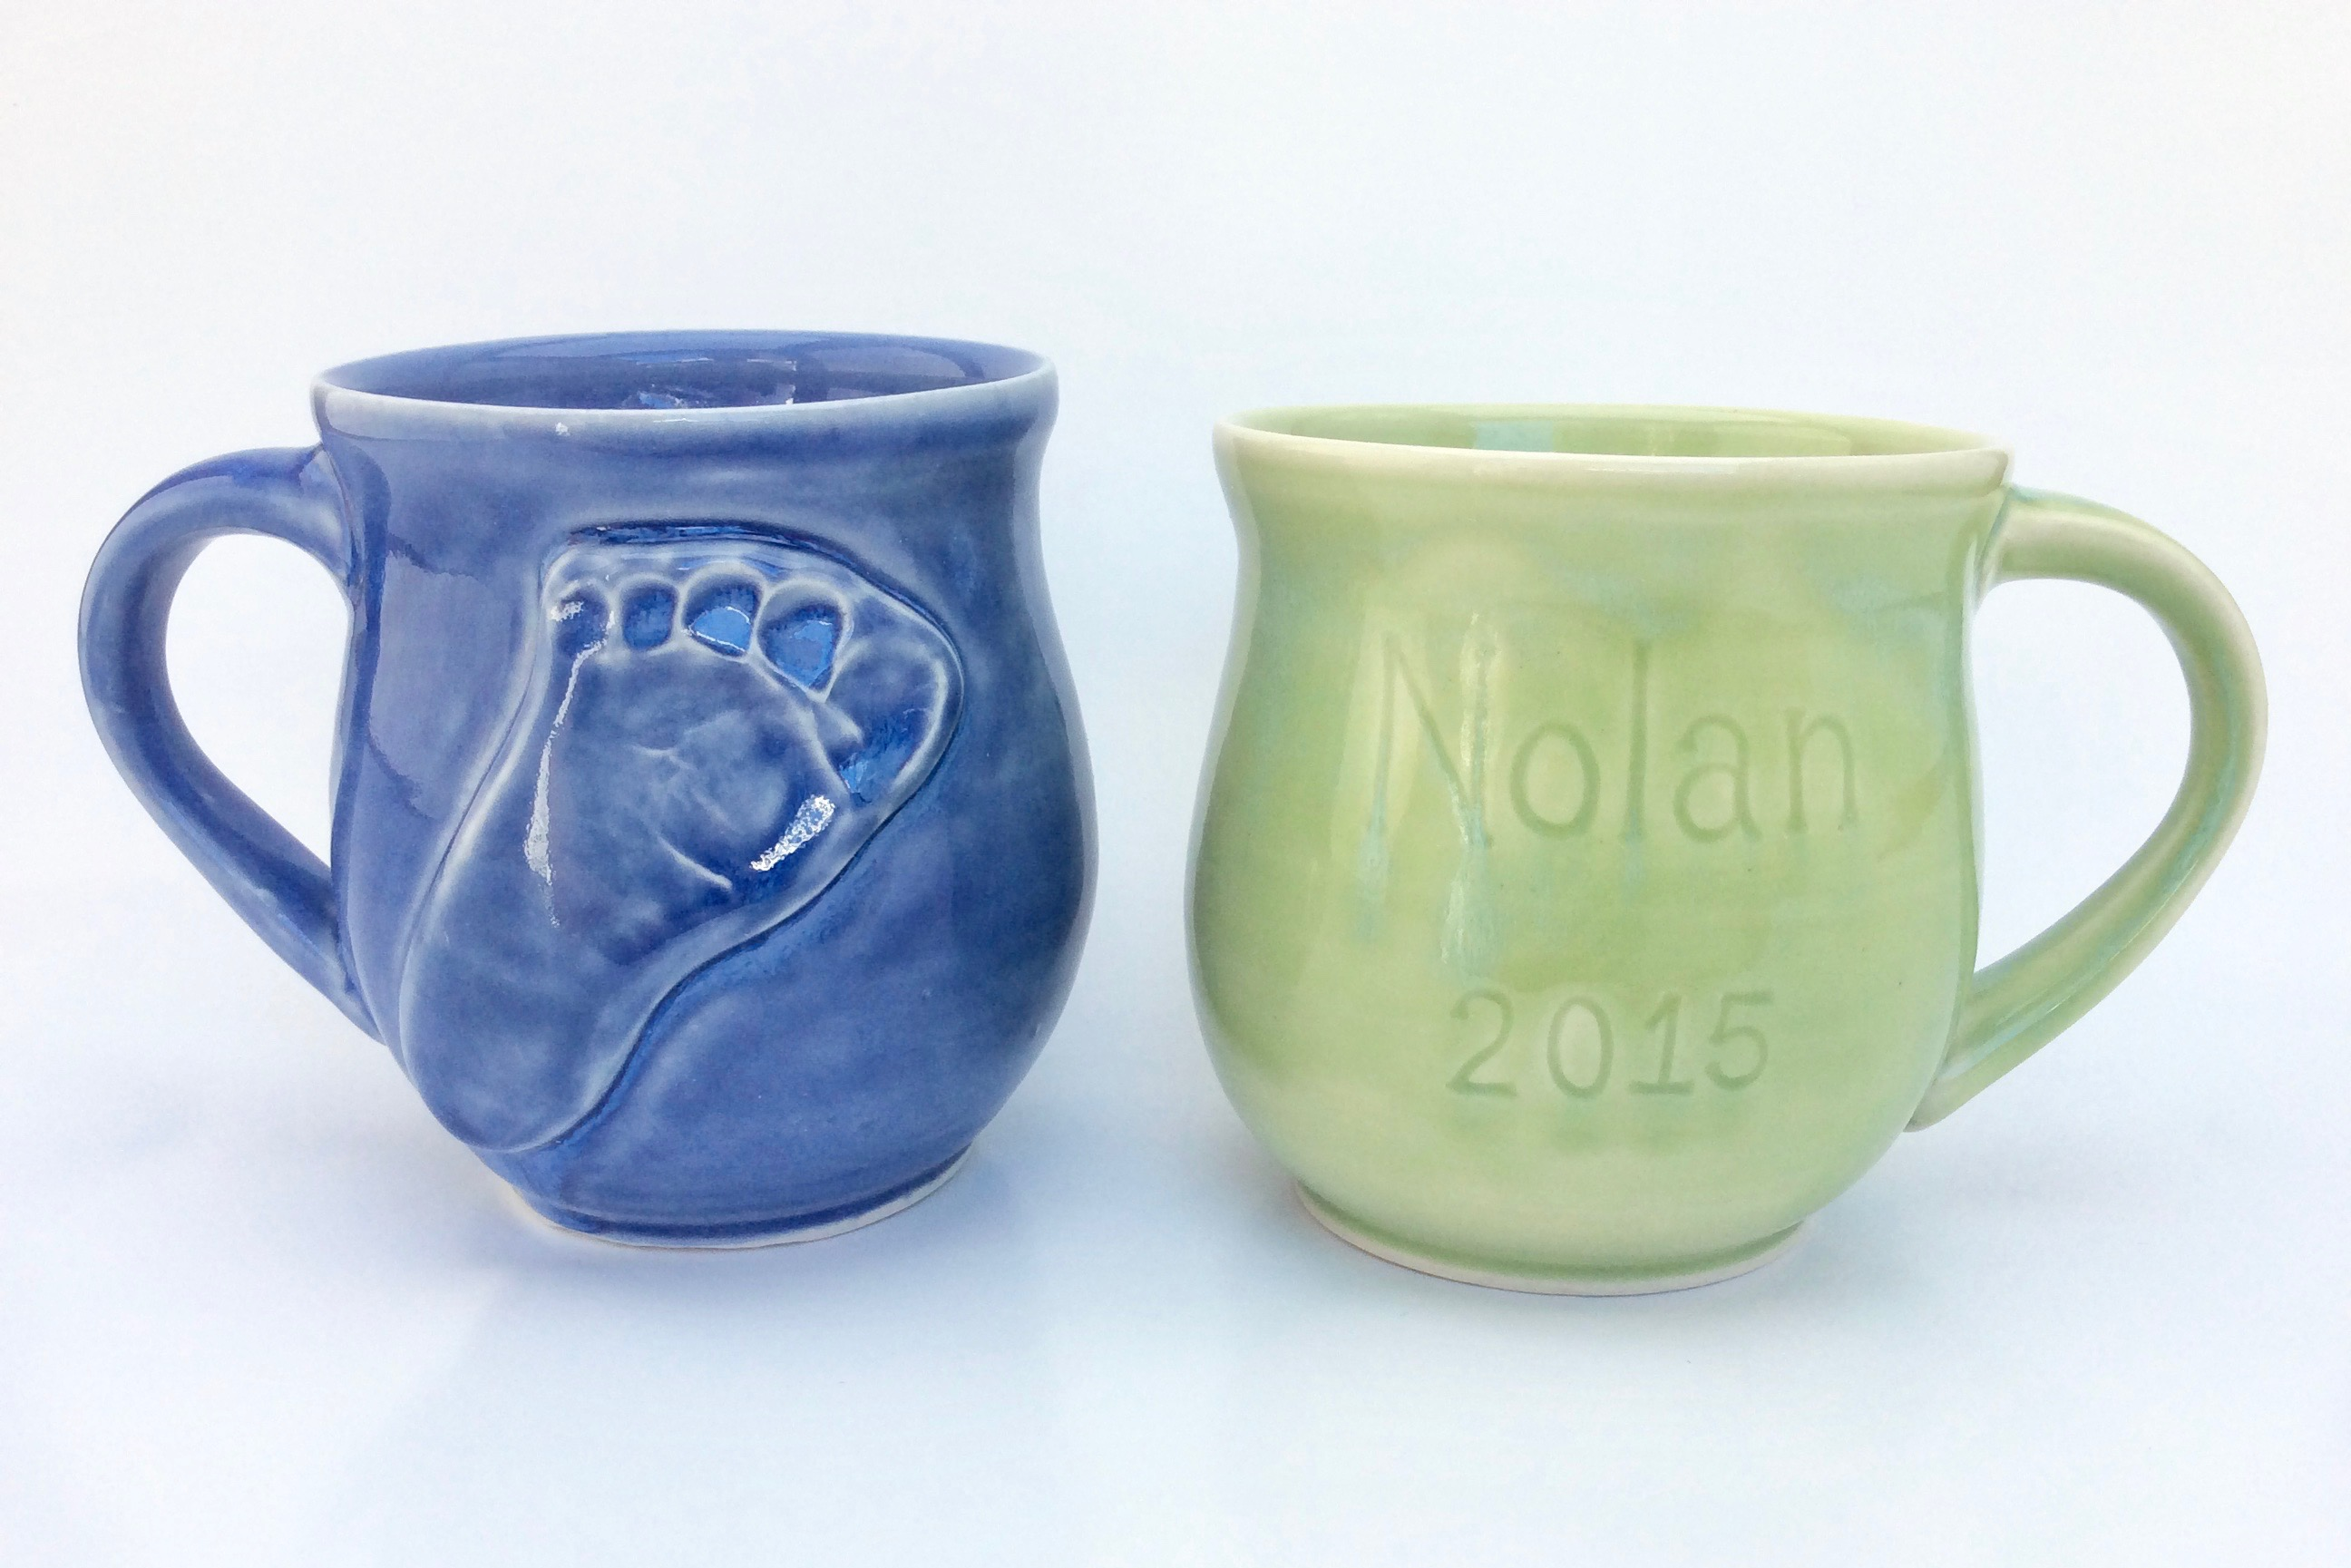 Baby Footprint Mugs (Commission)